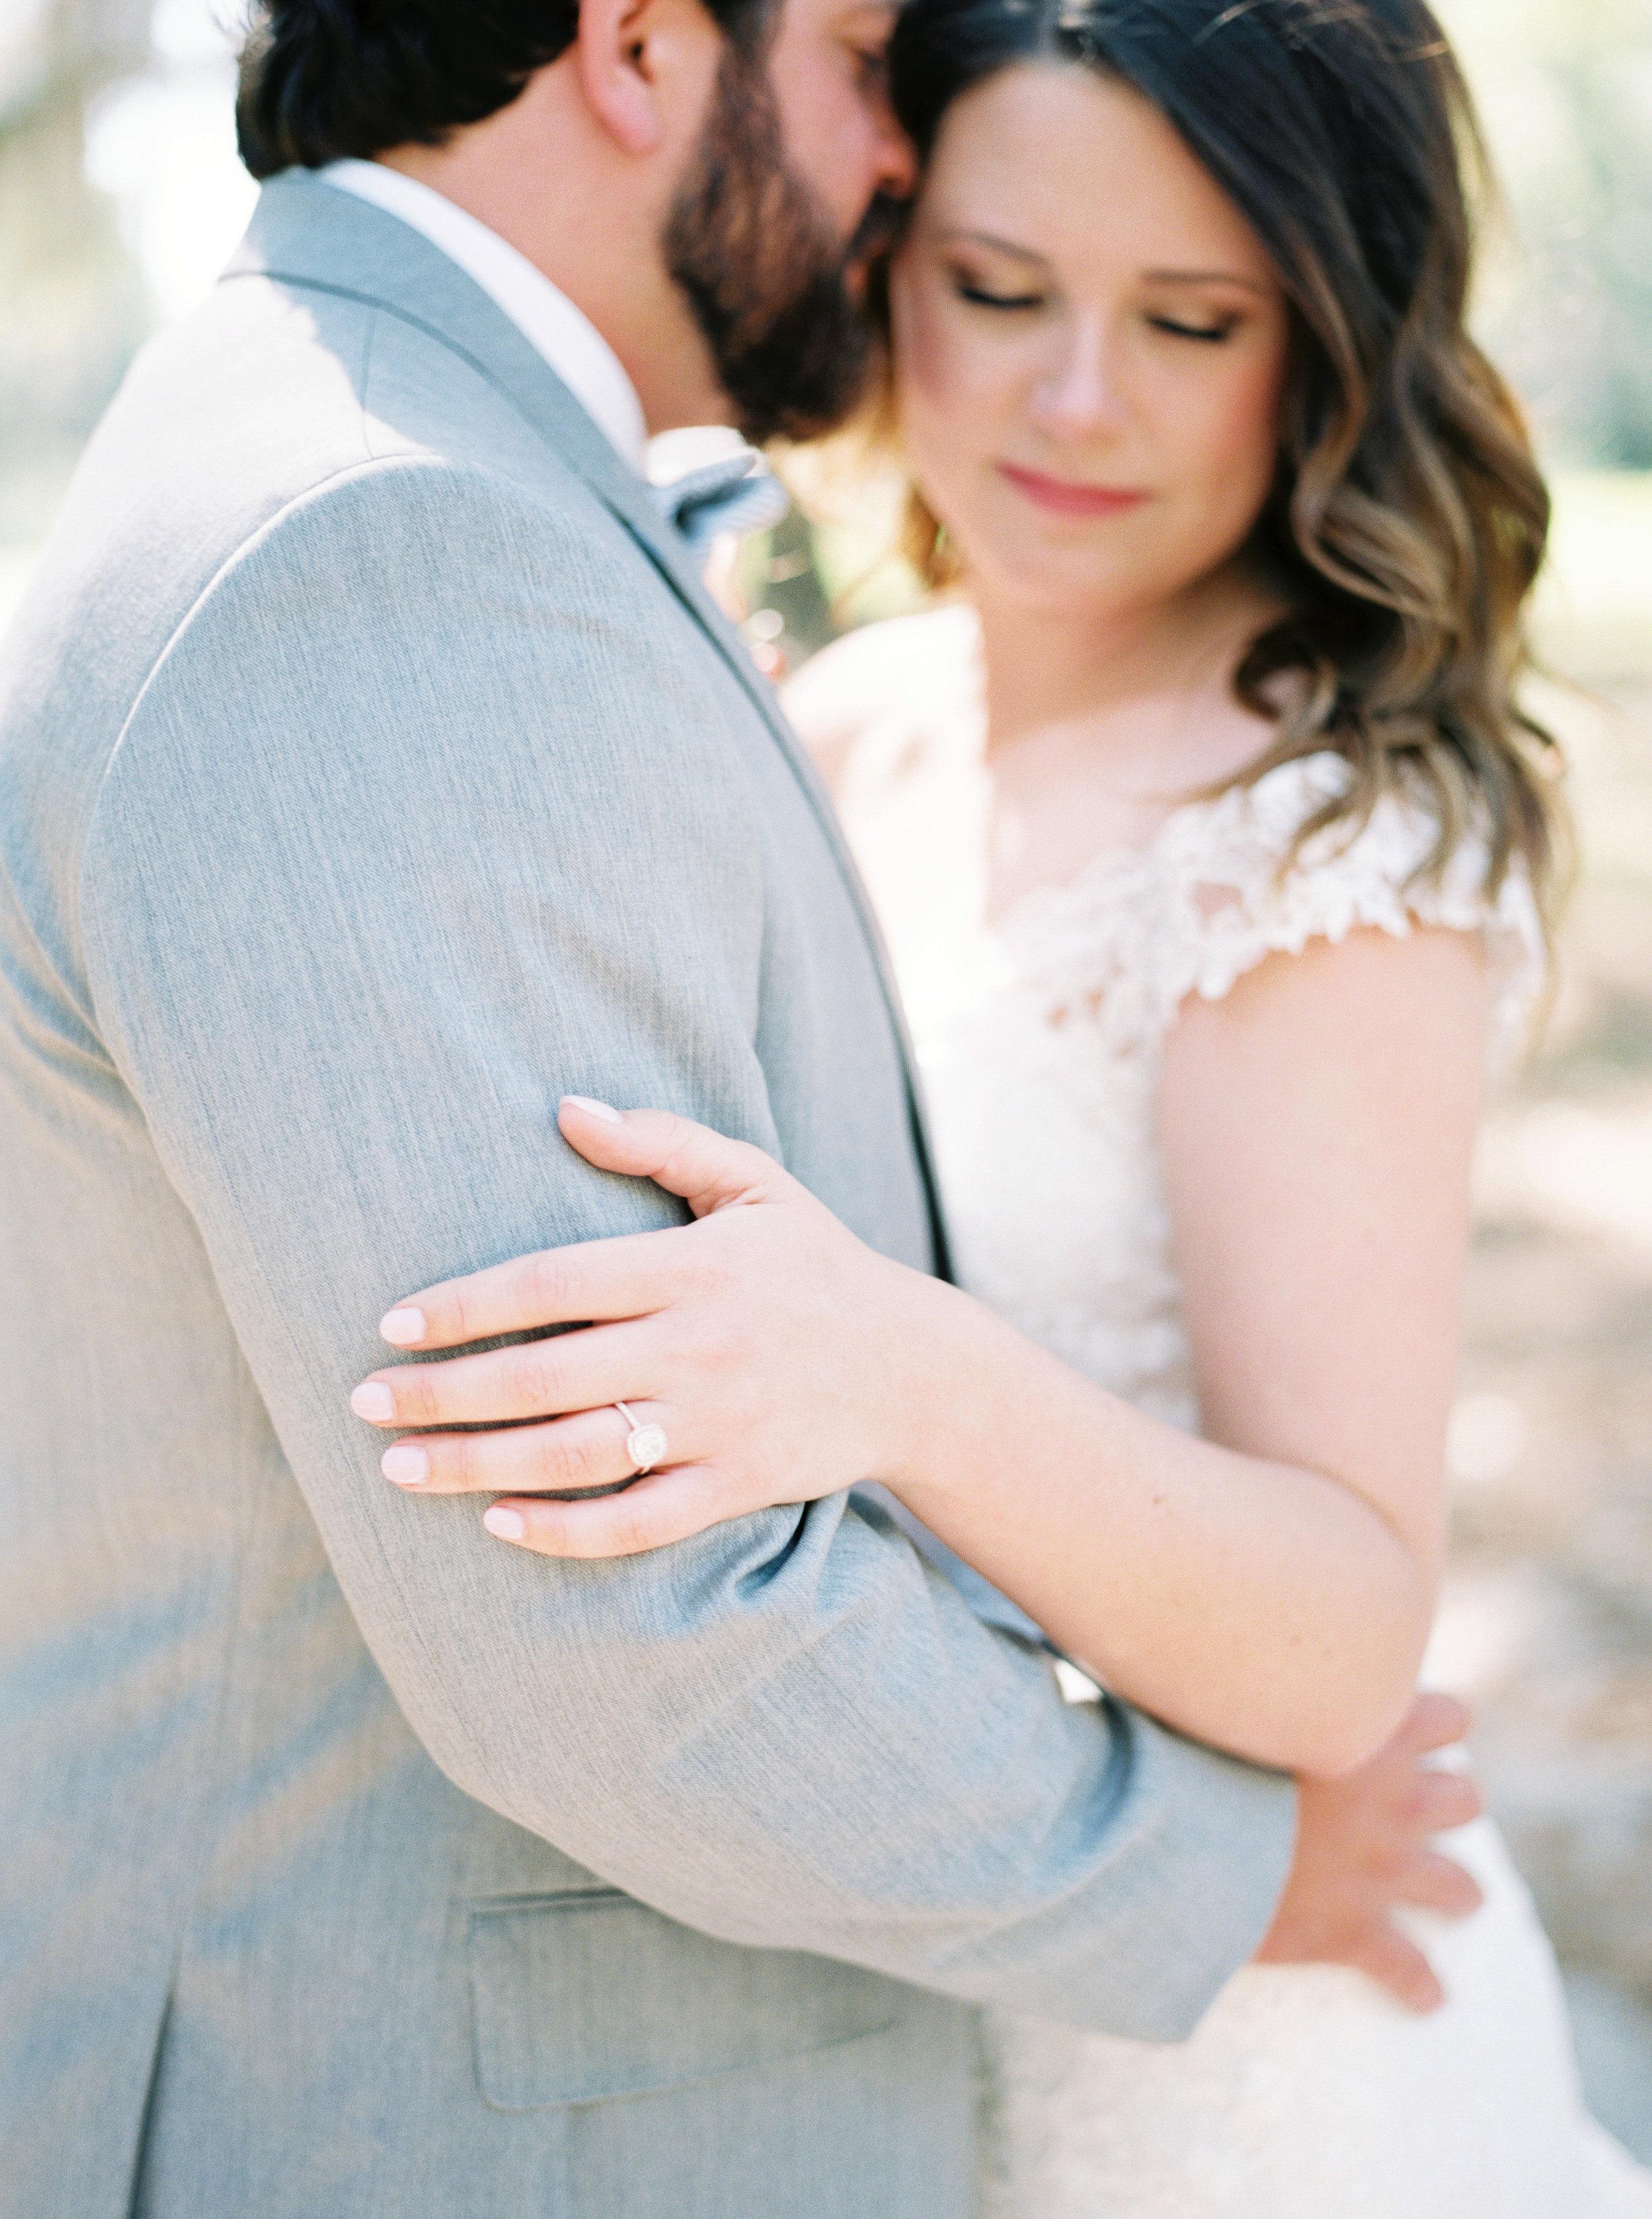 Fallen_Photography_Summer_Wedding_Outdoor_South_Georgia_Film_Wedding_Photography_Spanish_Moss-38.JPG